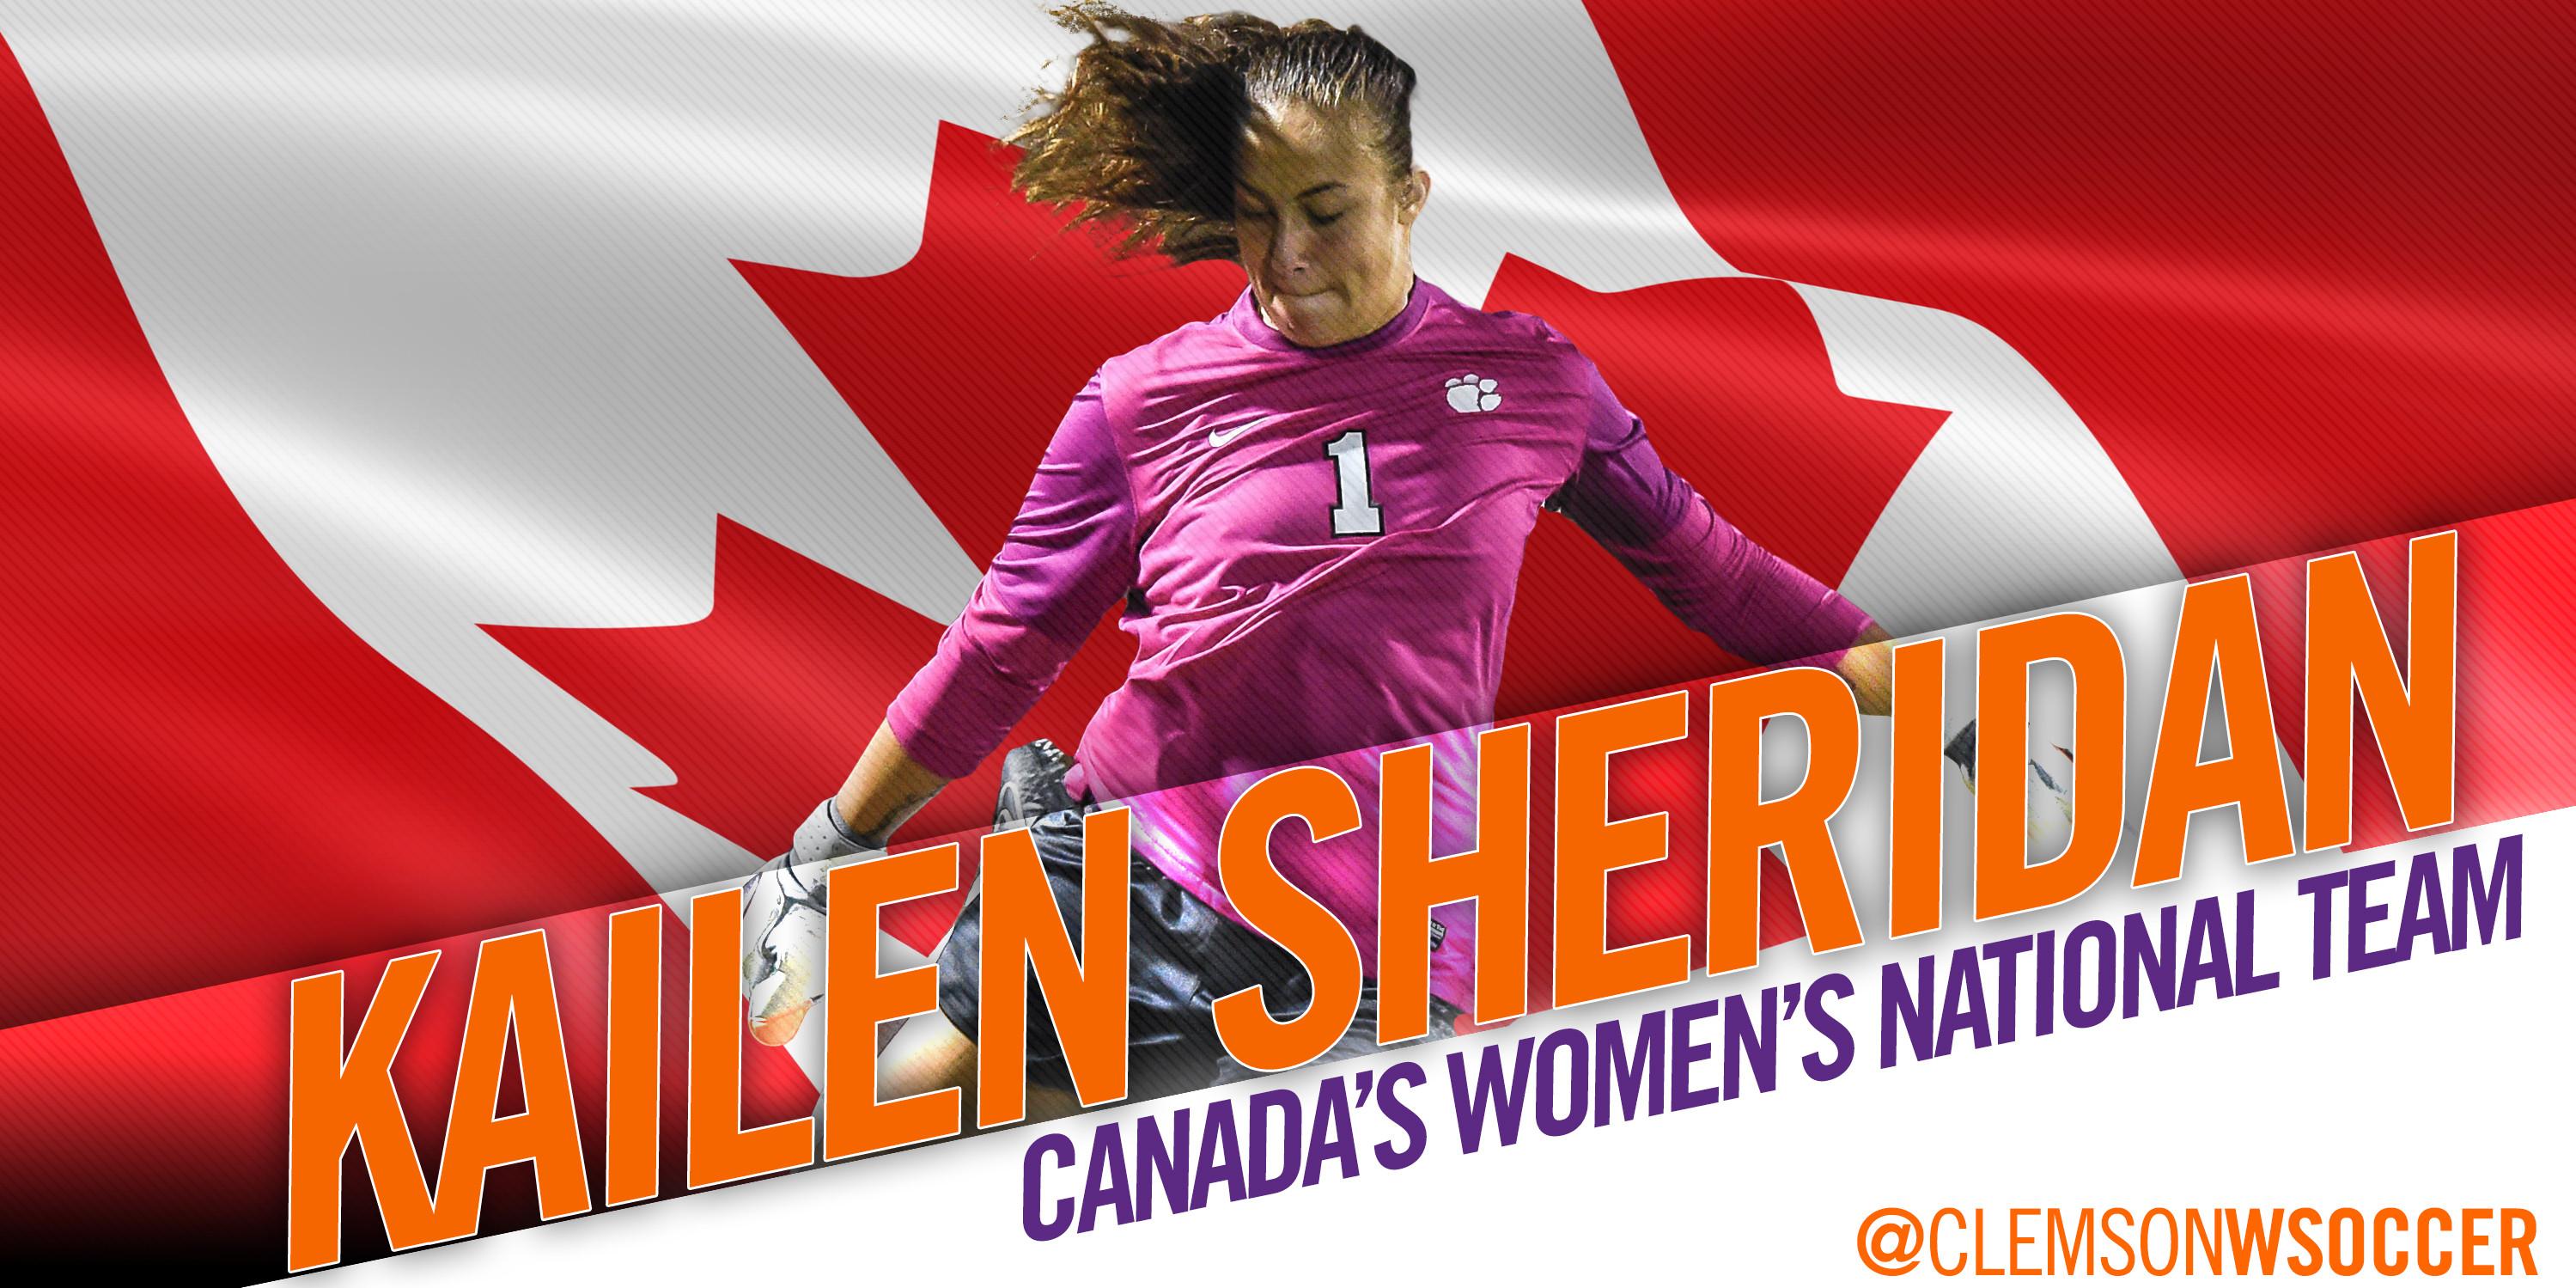 Sheridan joins National Team